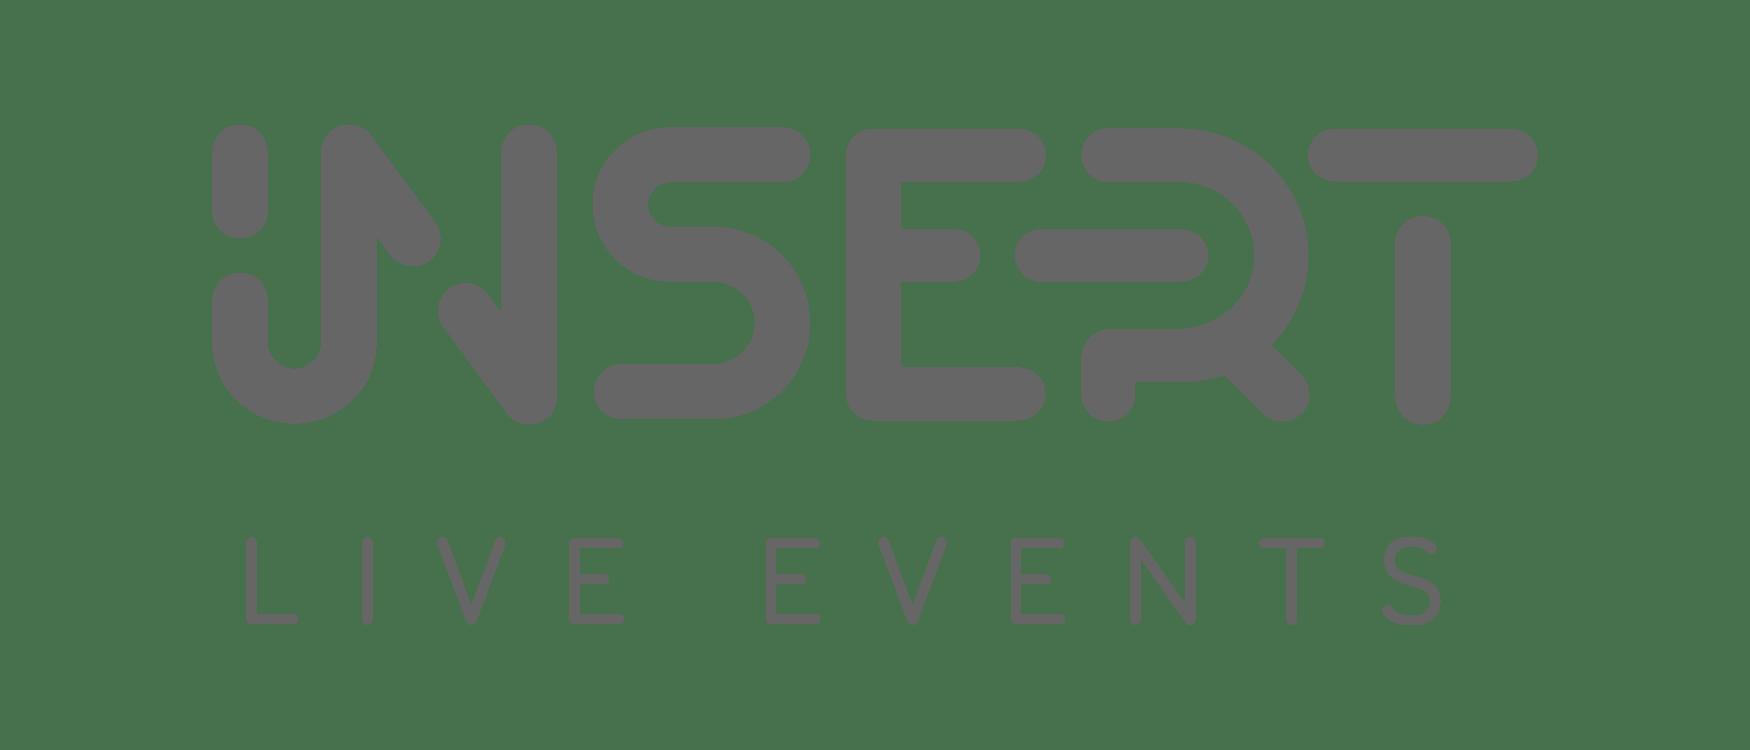 insert live events rebranding, grey logo